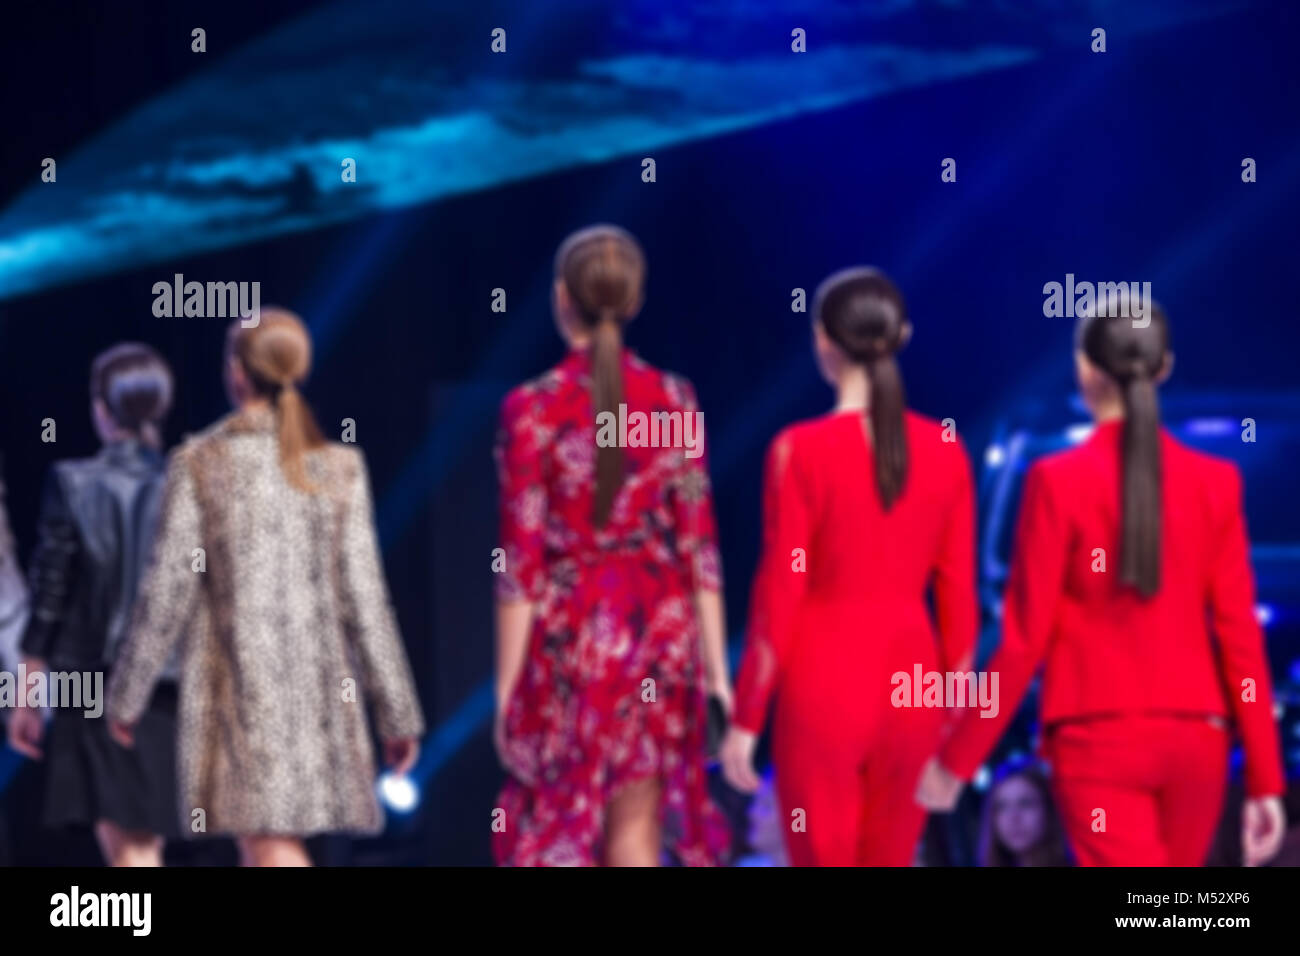 Sofia Fashion Week female models backs red suits - Stock Image